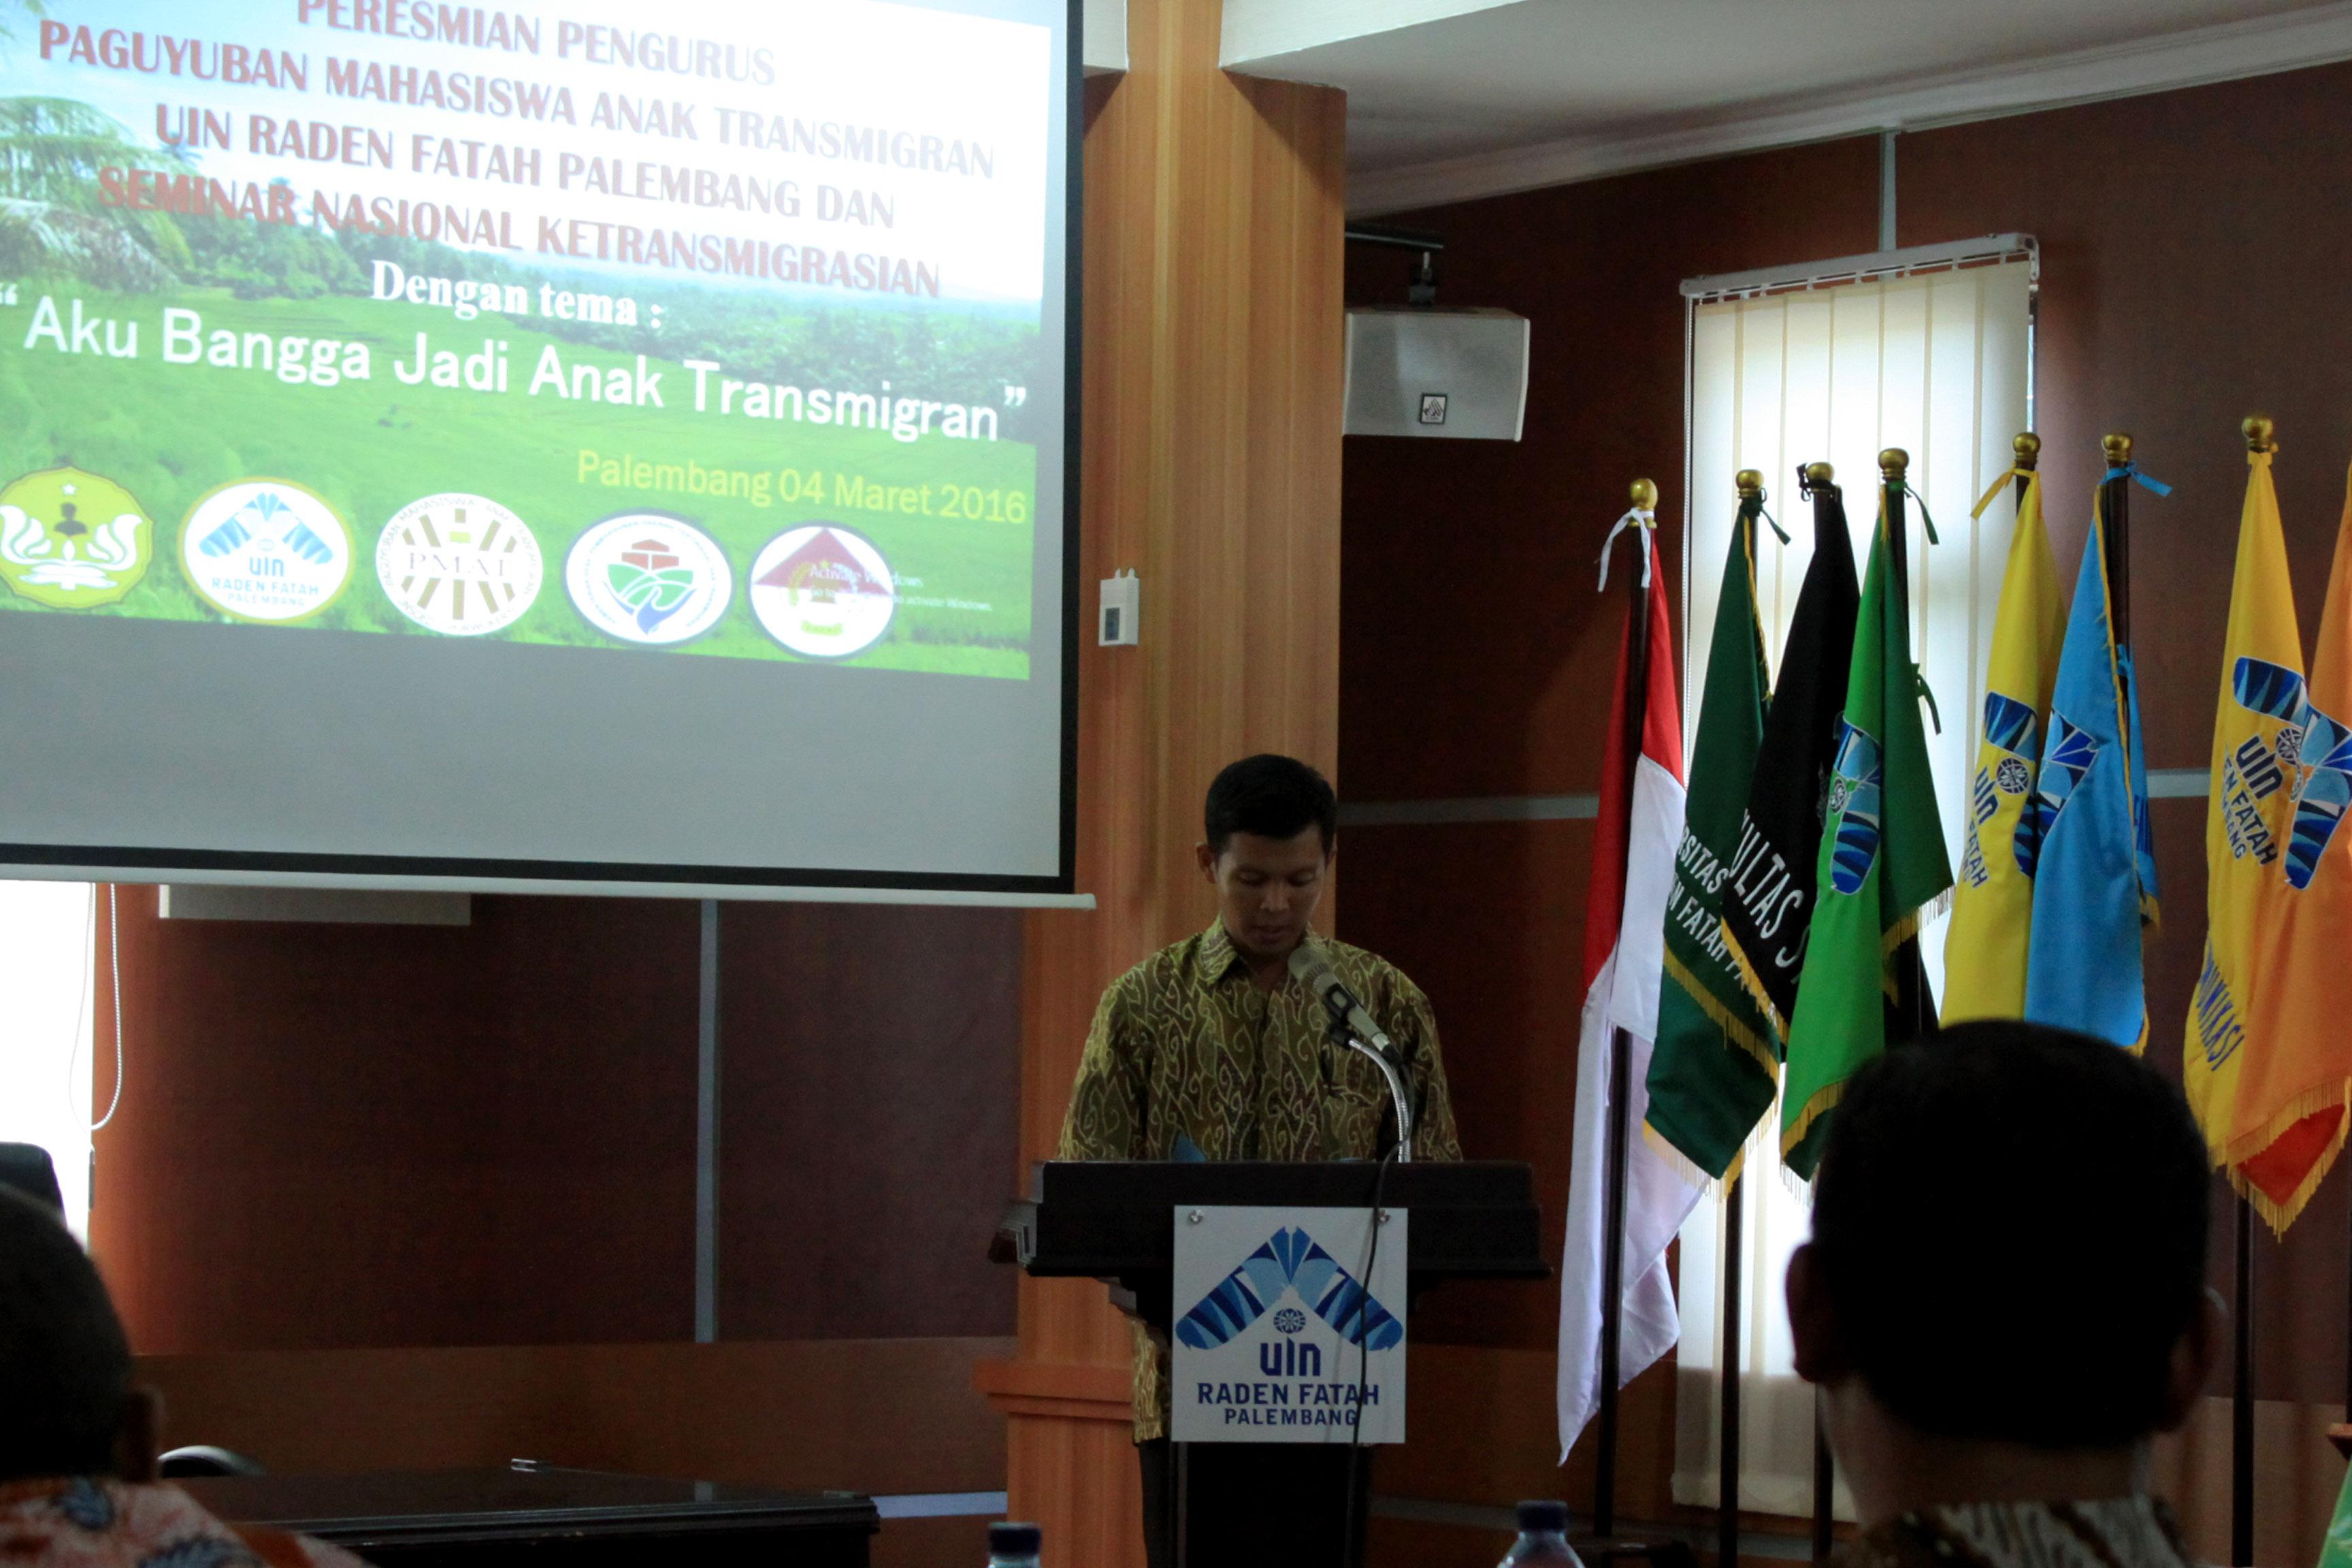 SAMBUTAN - Salah satu perwakilan anggota PMAT menberikan sambutan dalam rangkaian acara yang digelar di Gedung Rektorat UIN Raden Fatah Palembang, Jumat (04/03/2016).  Abay/ukhuwahnews.com